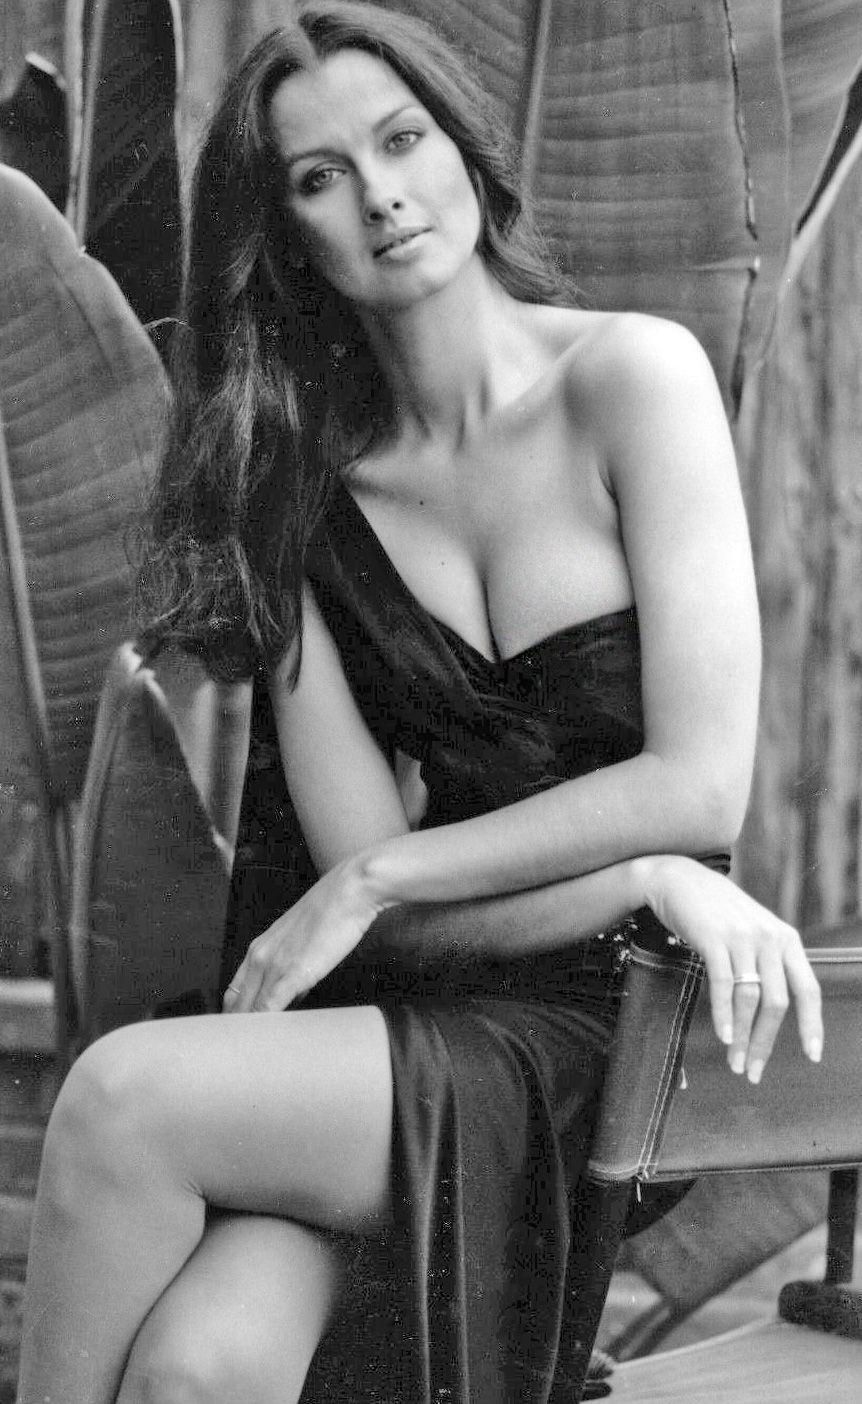 Watch Veronica Hamel born November 20, 1943 (age 74) video